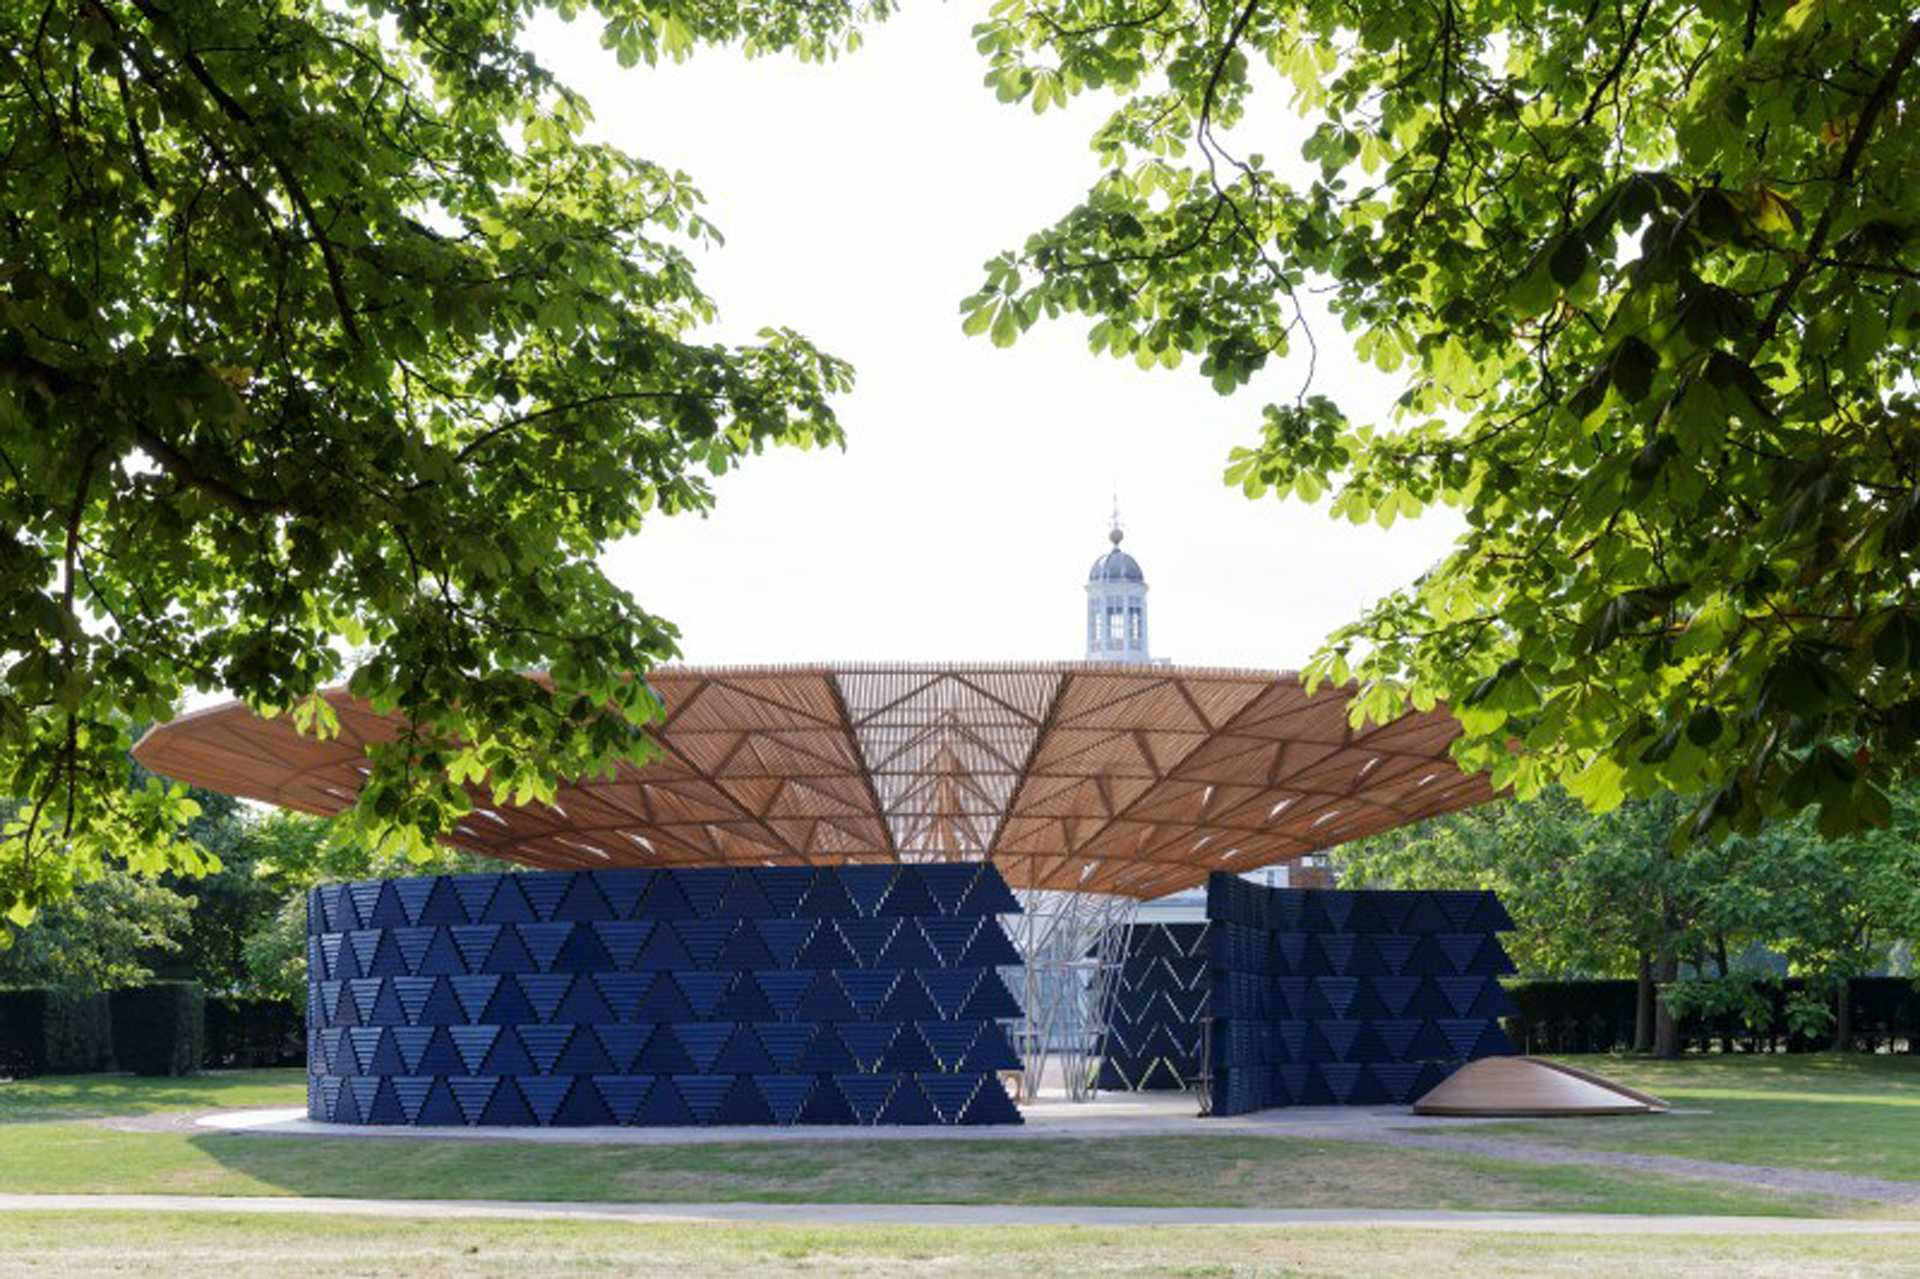 Serpentine Pavilion 2017  - 53 01 30